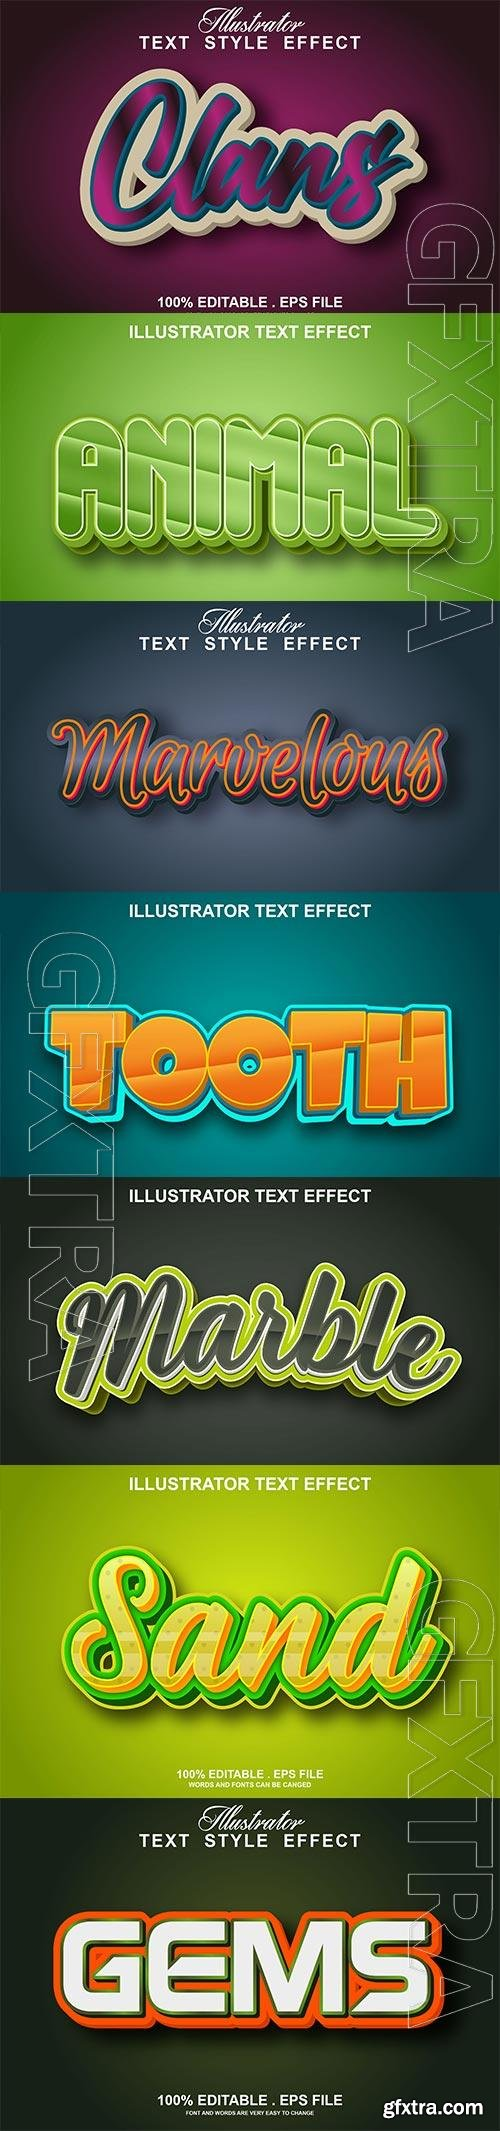 Set 3d editable text style effect vector vol 189